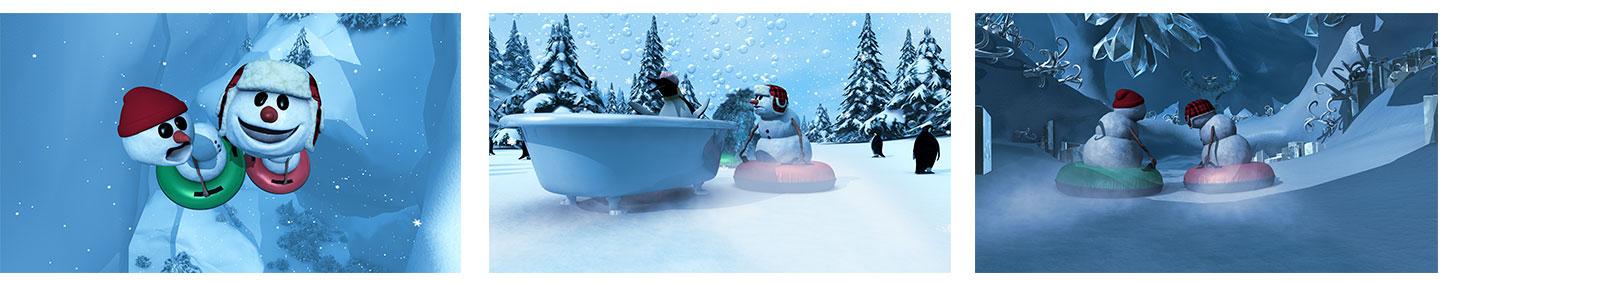 still_winter-wipeout-ride